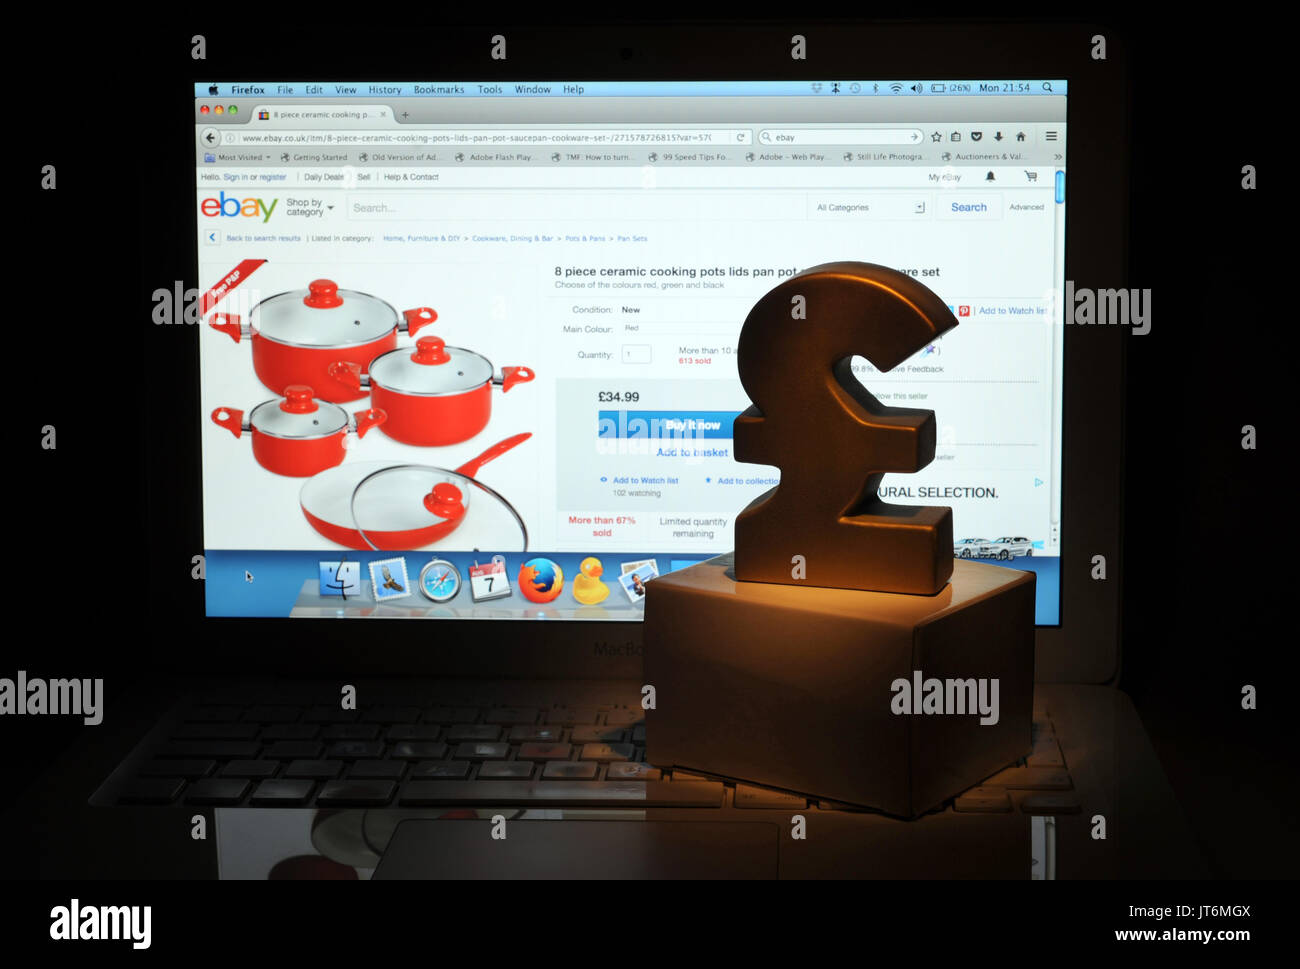 British pound sign stock photos british pound sign stock images ebay page on laptop with british pound sign re online buying internet shopping the economy uk biocorpaavc Choice Image